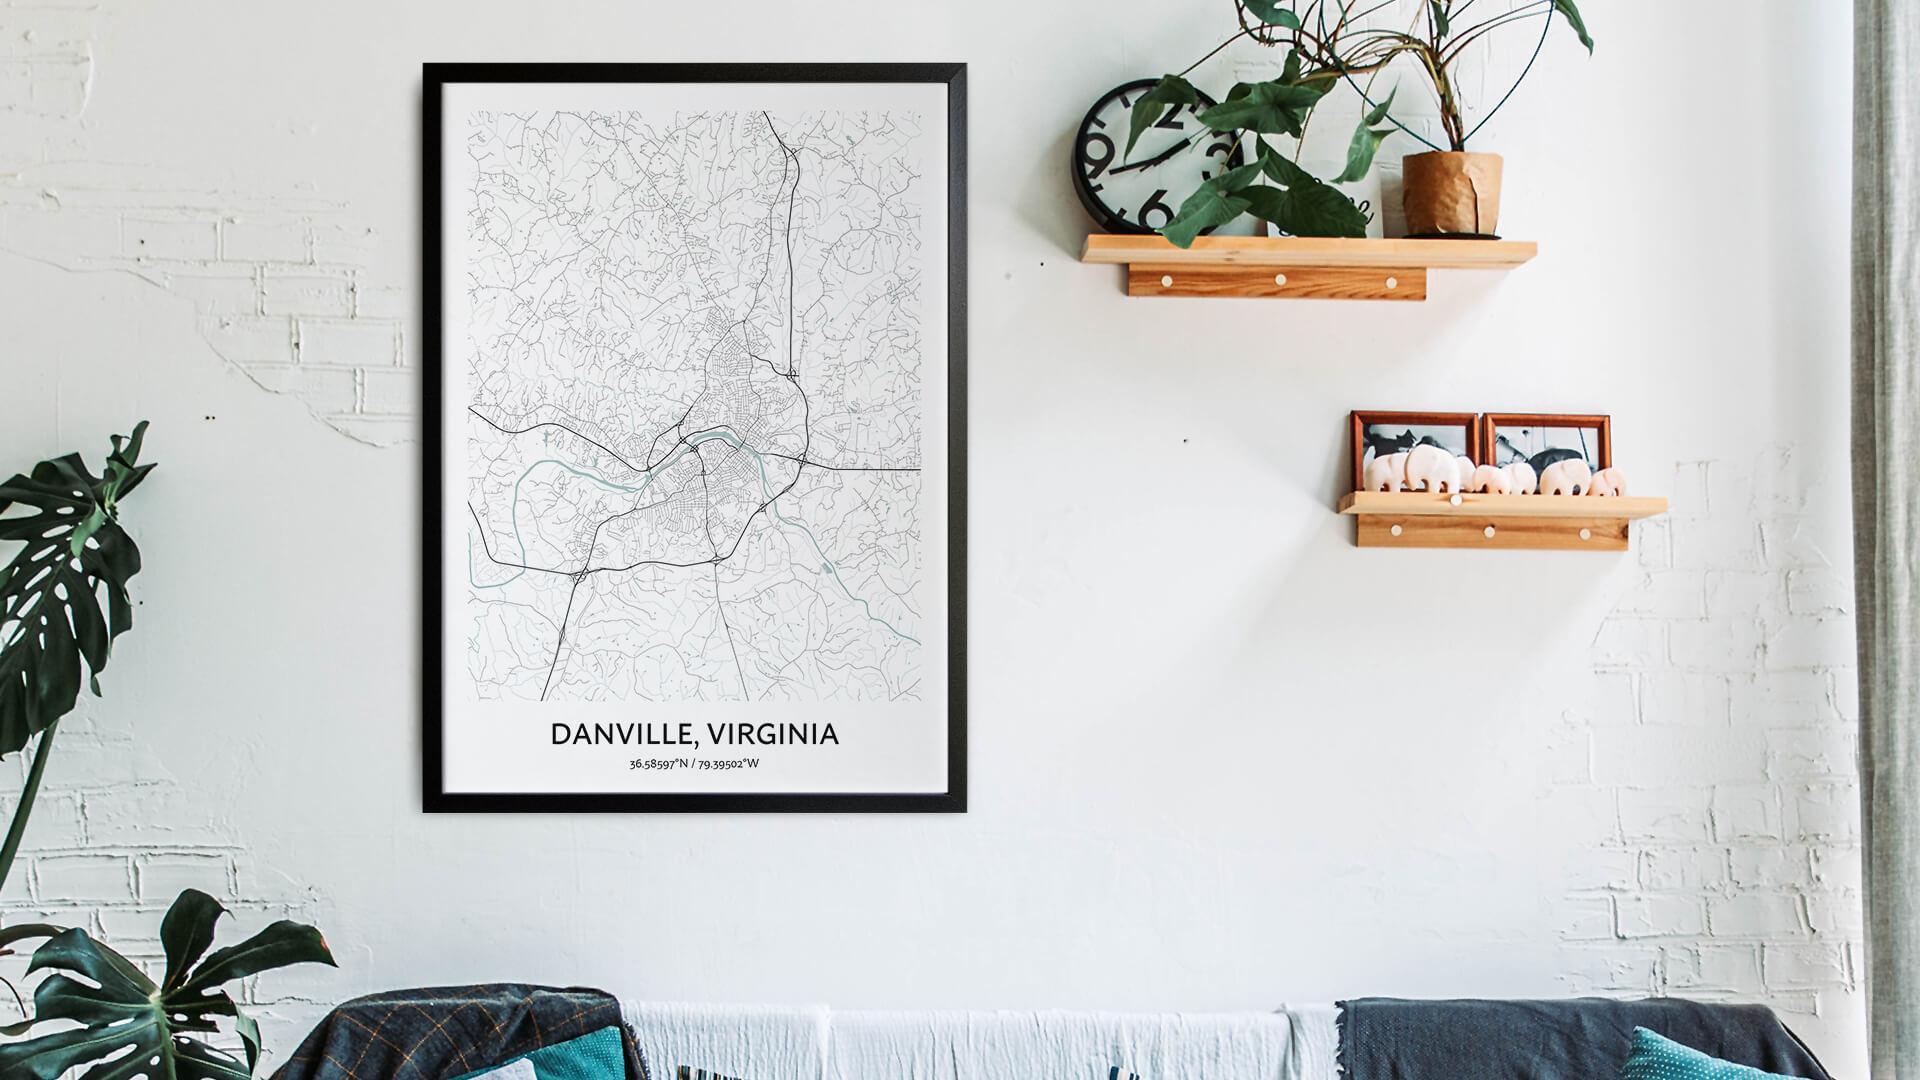 Danville Virginia map art